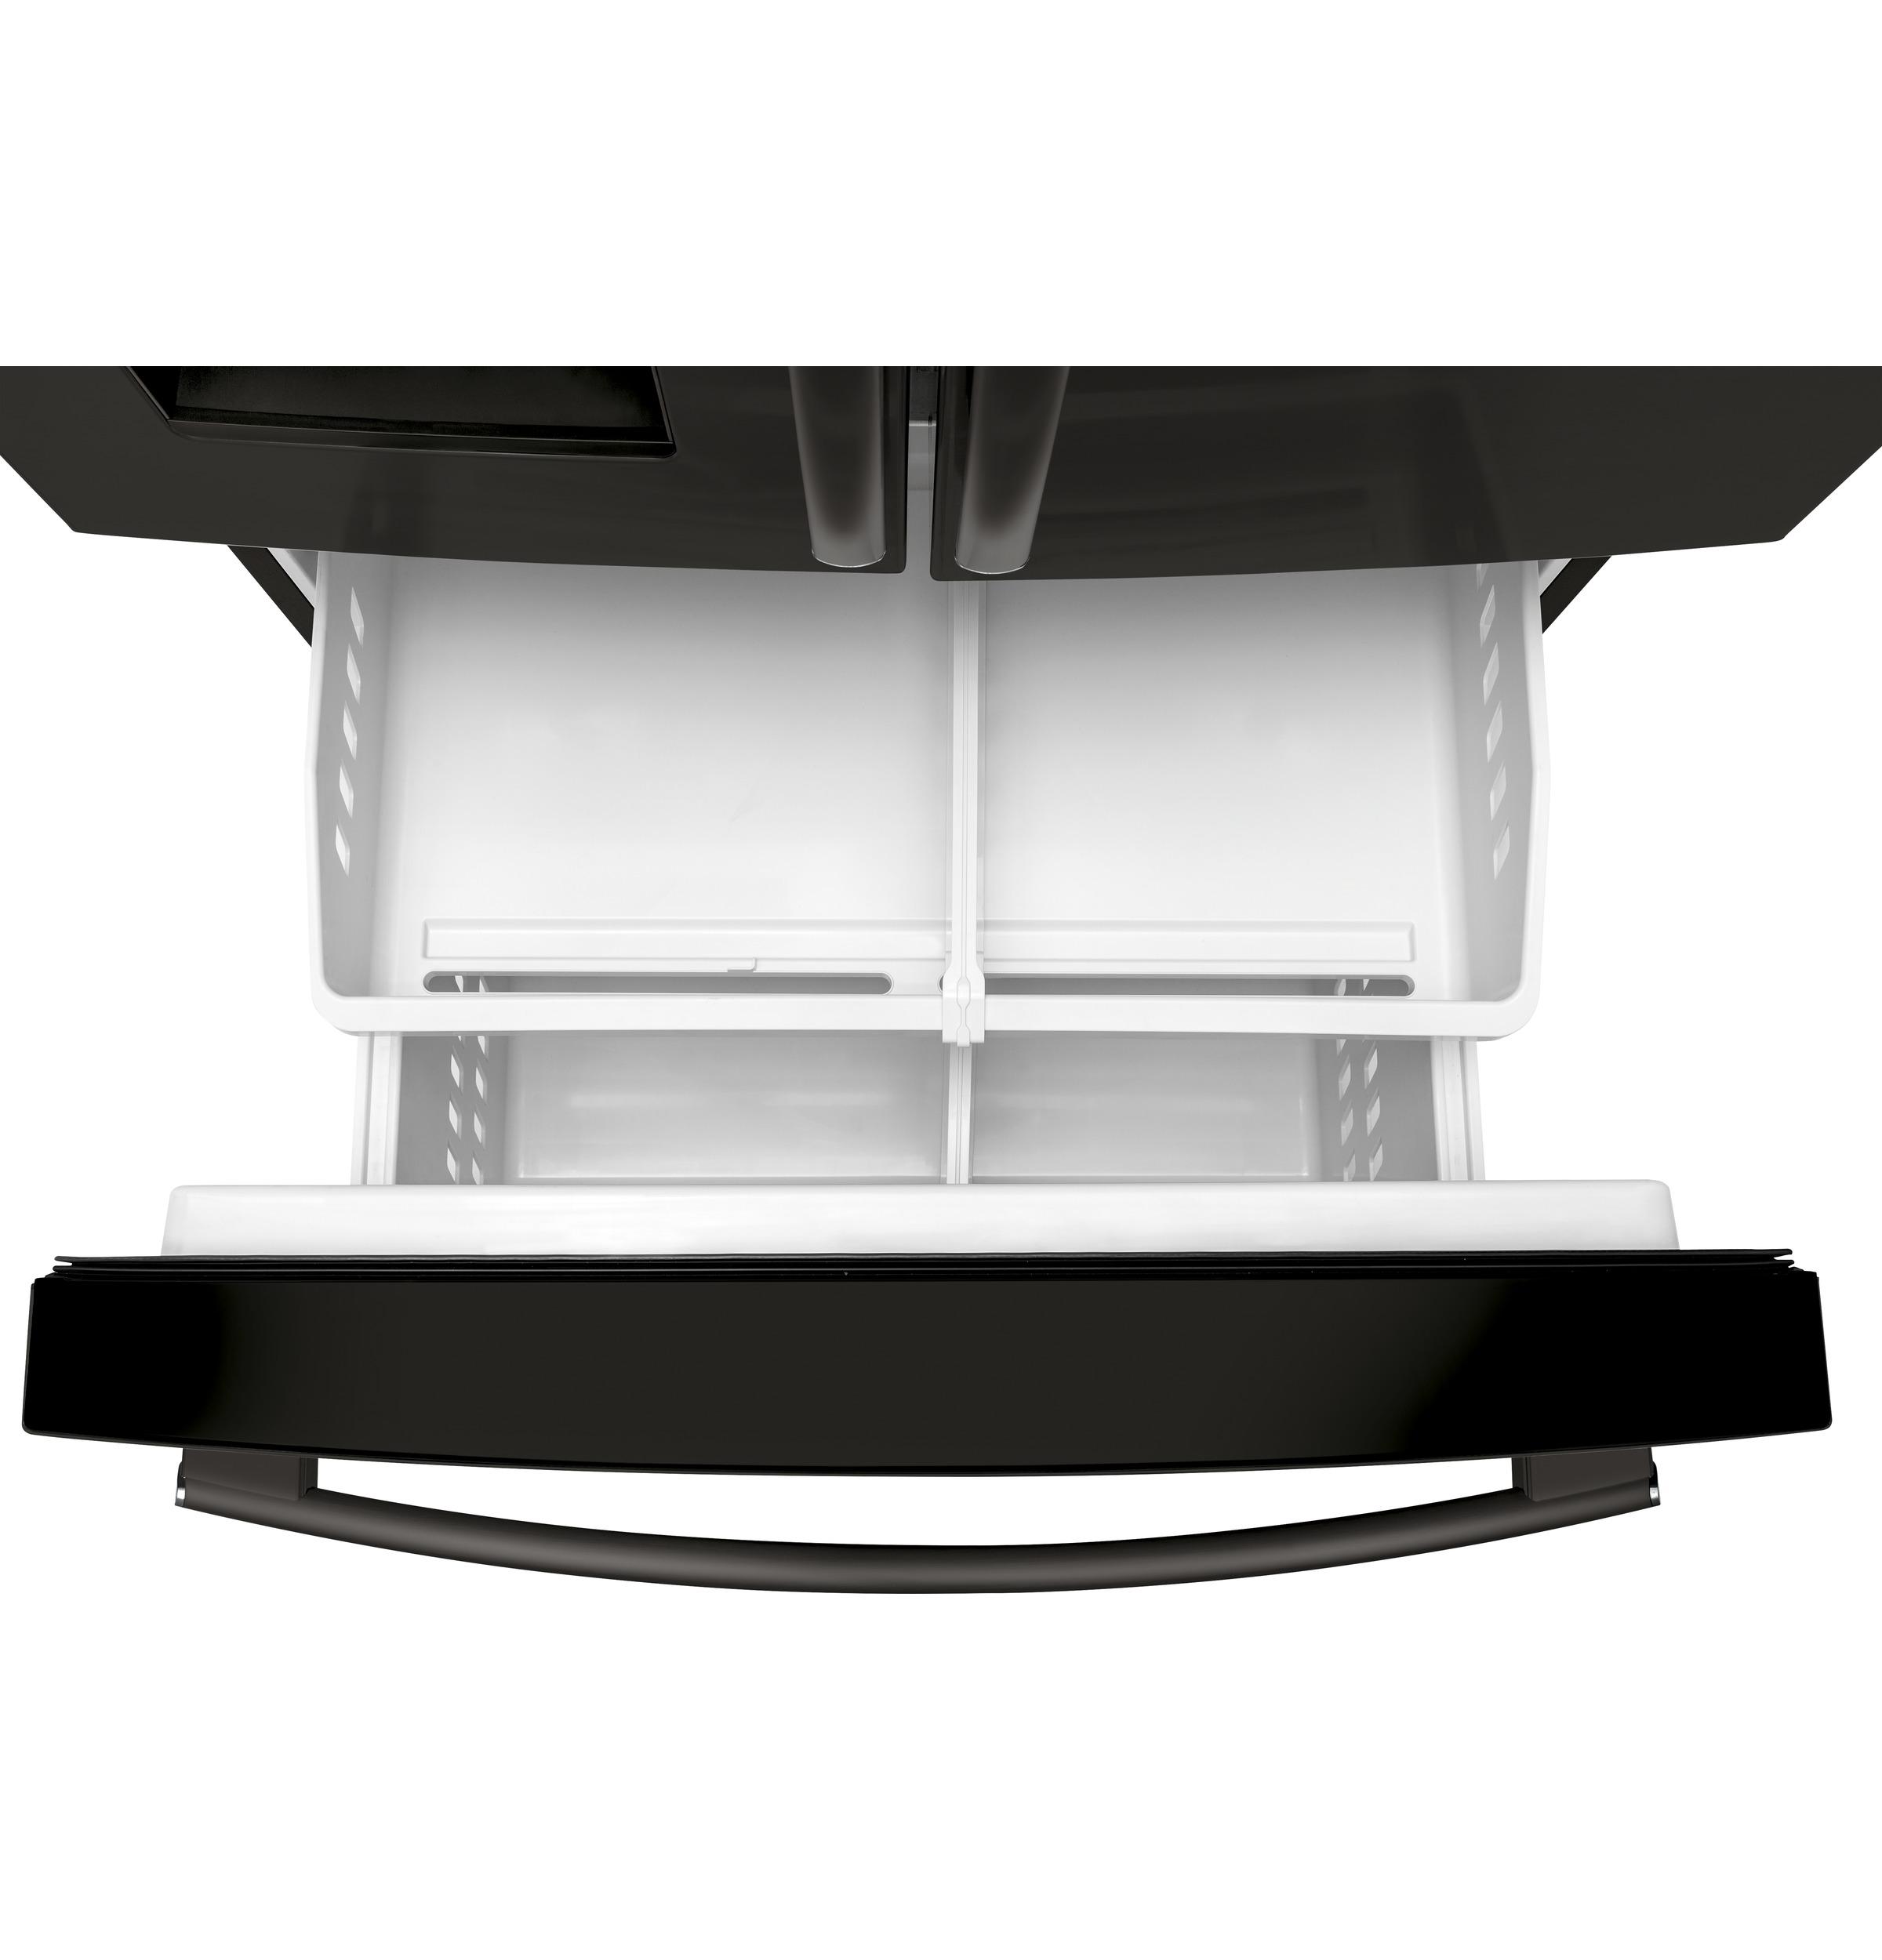 Model: GFE26JBMTS | GE® ENERGY STAR® 25.6 Cu. Ft. French-Door Refrigerator